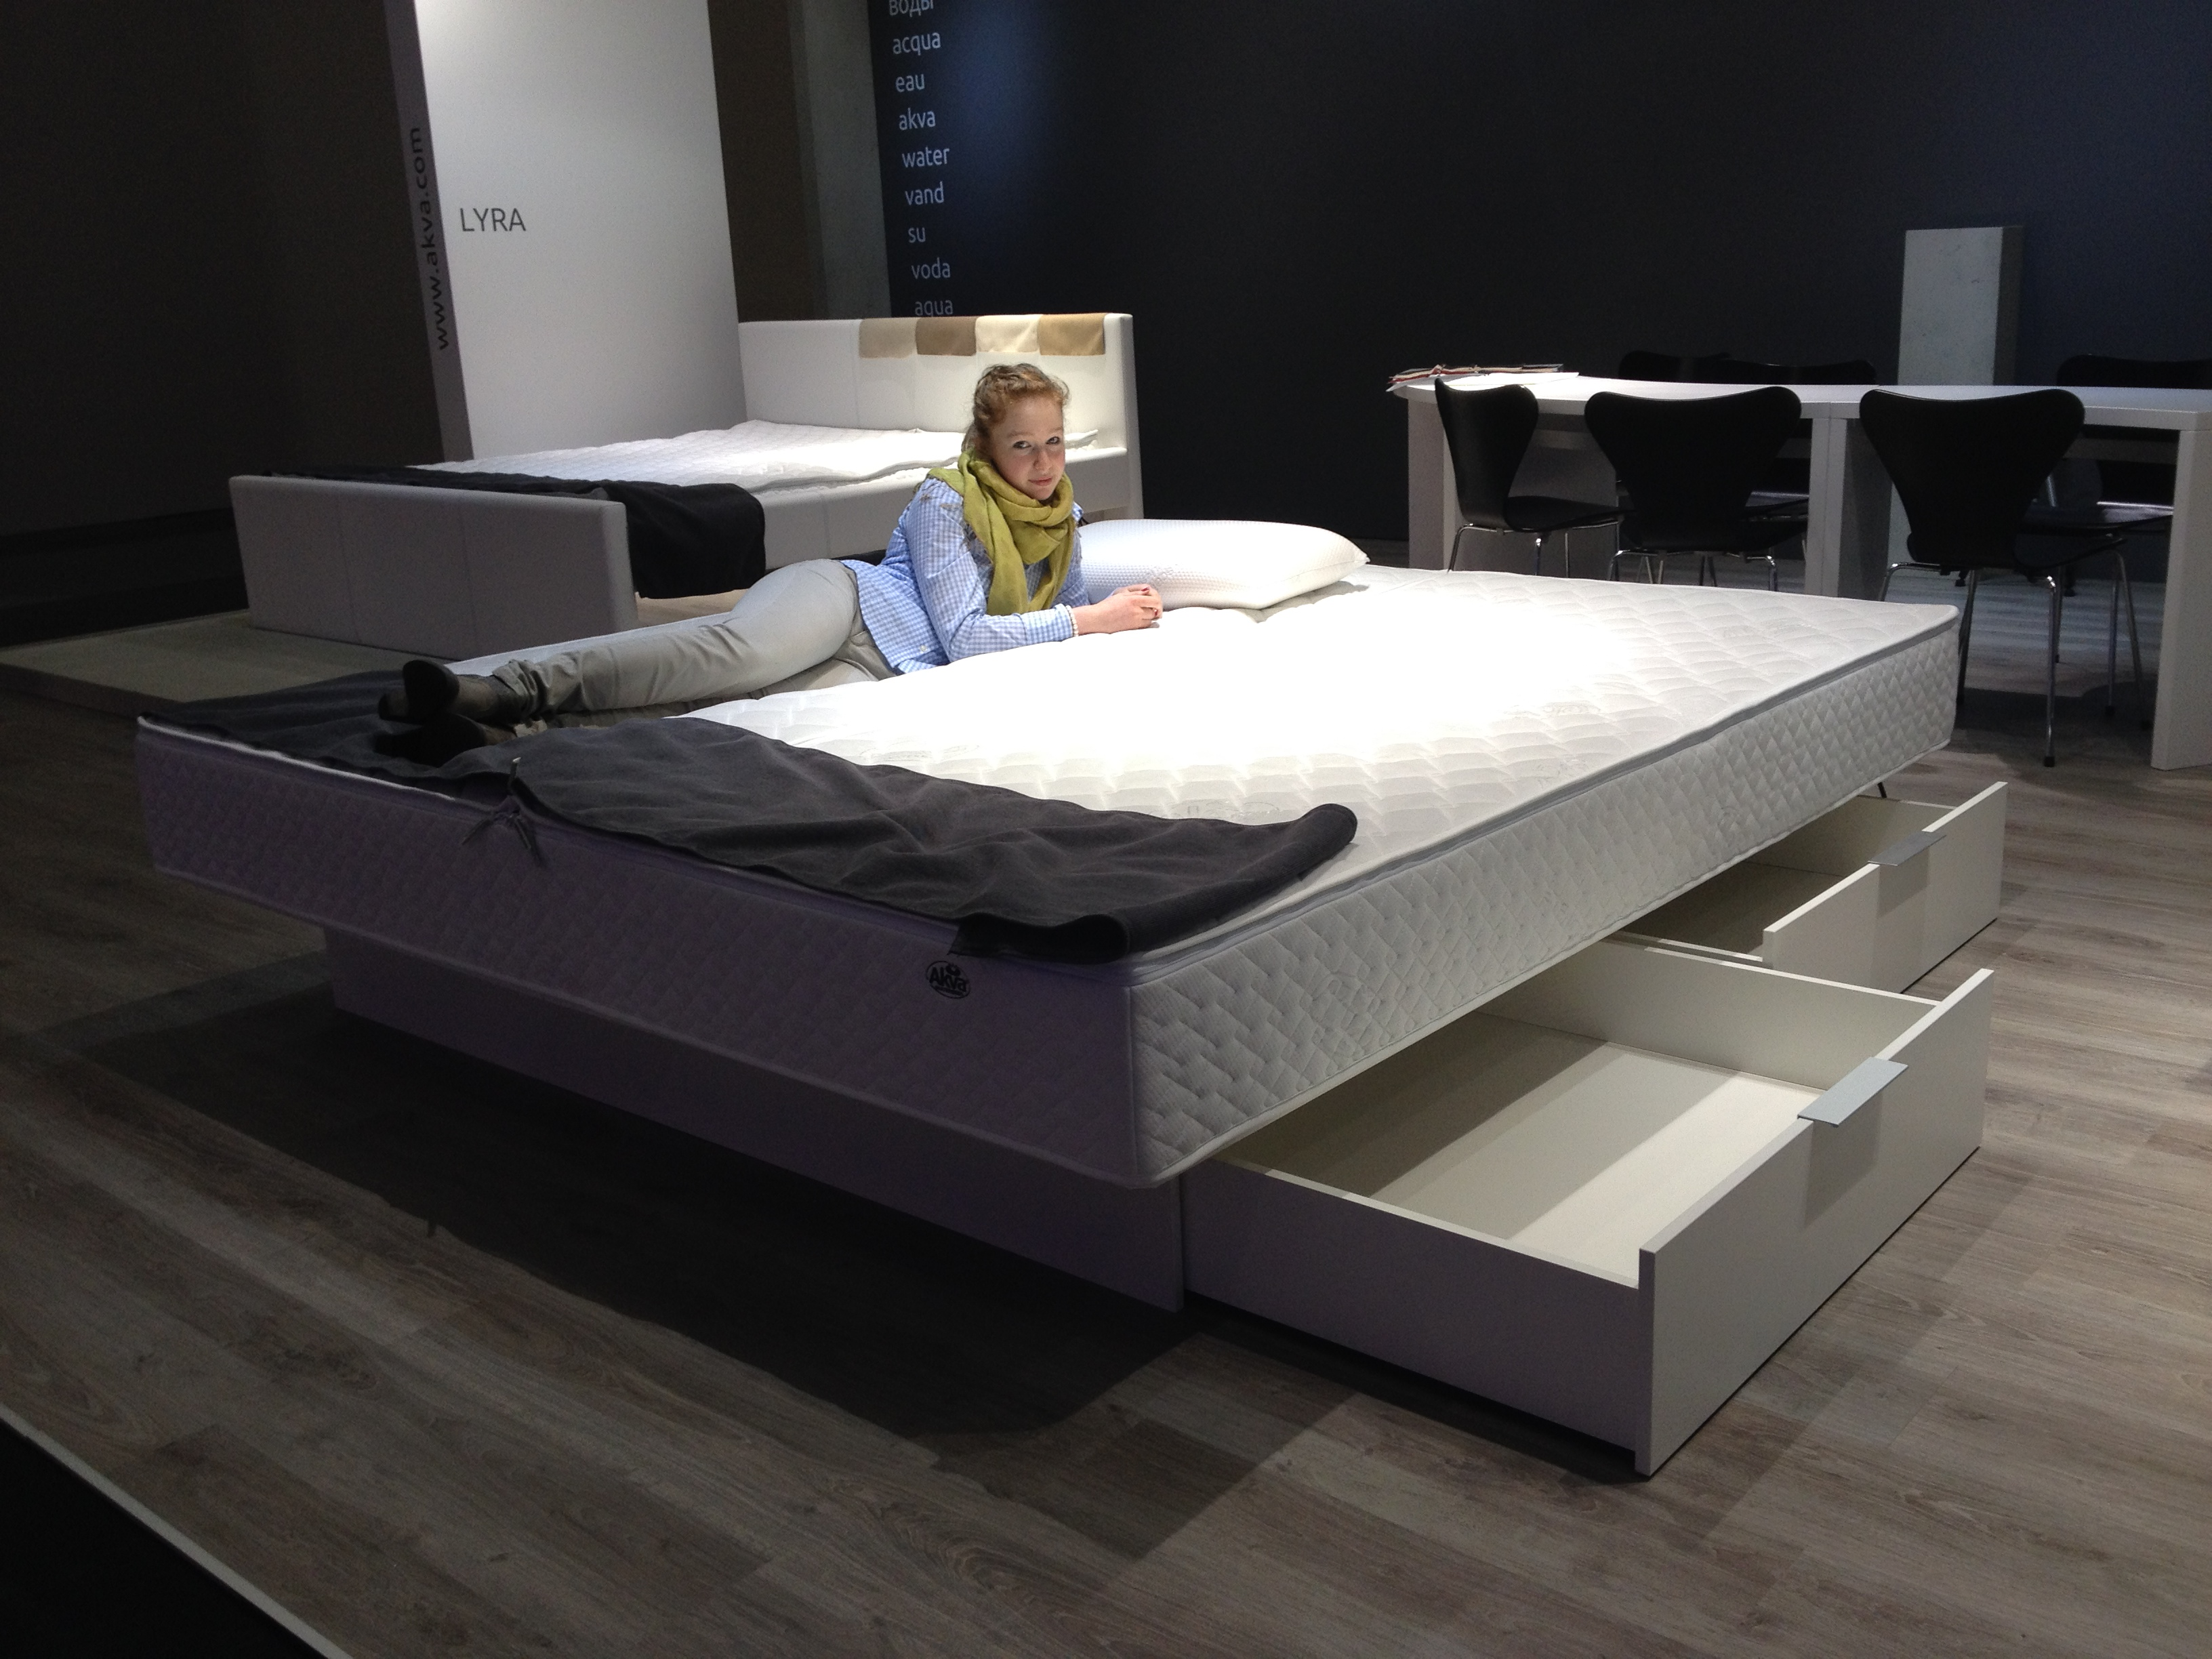 wasserbetten schlafoase hoenig. Black Bedroom Furniture Sets. Home Design Ideas